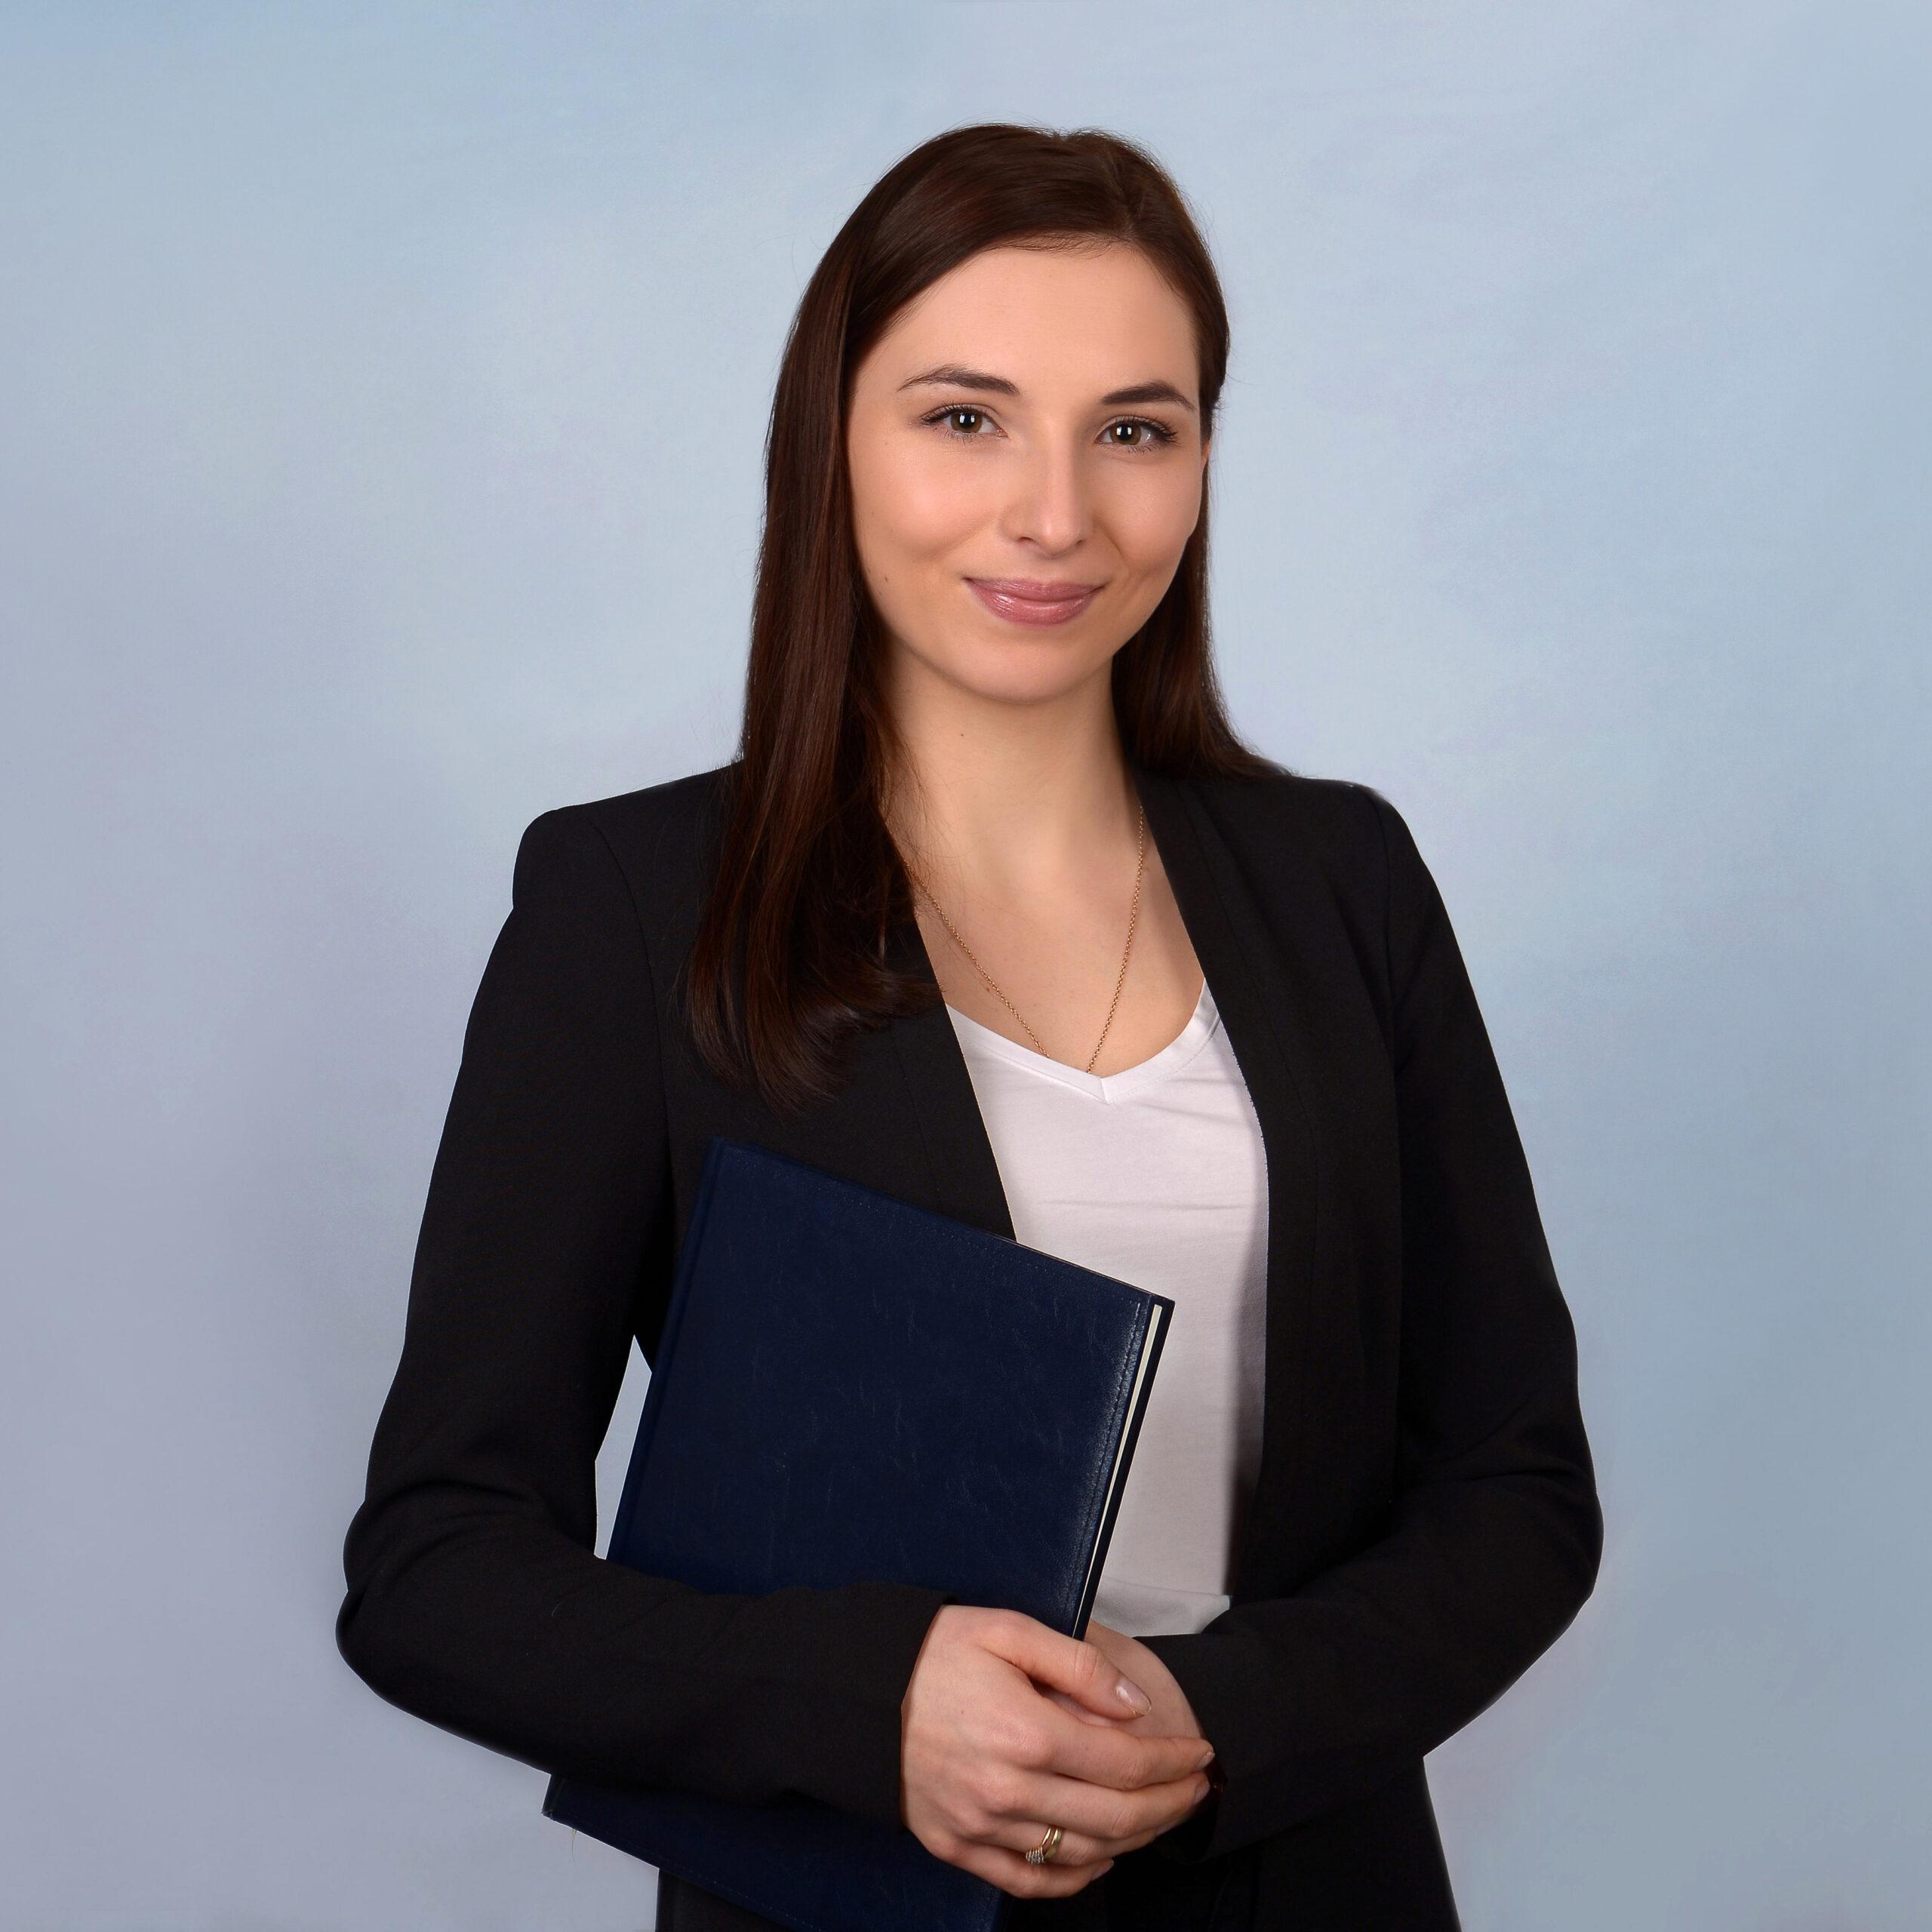 Joanna Pazdan